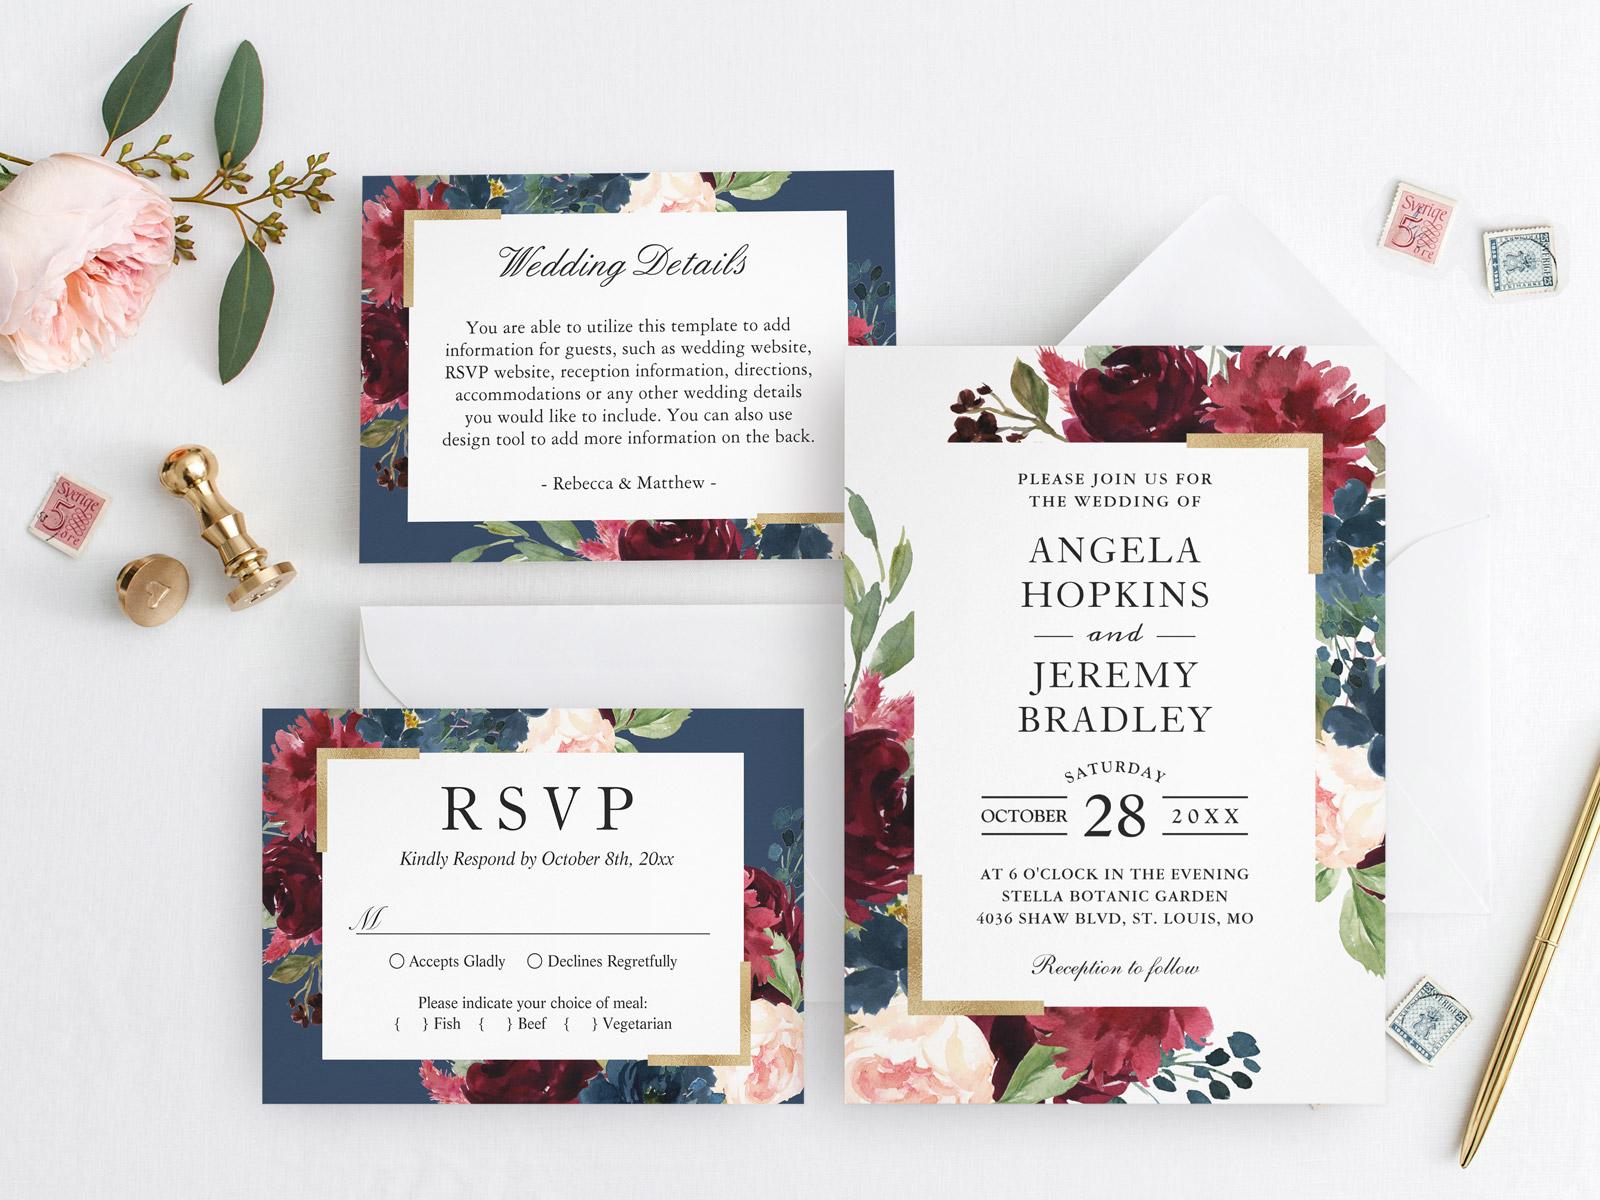 Mimoprints | Invitations, Cards & Stationery